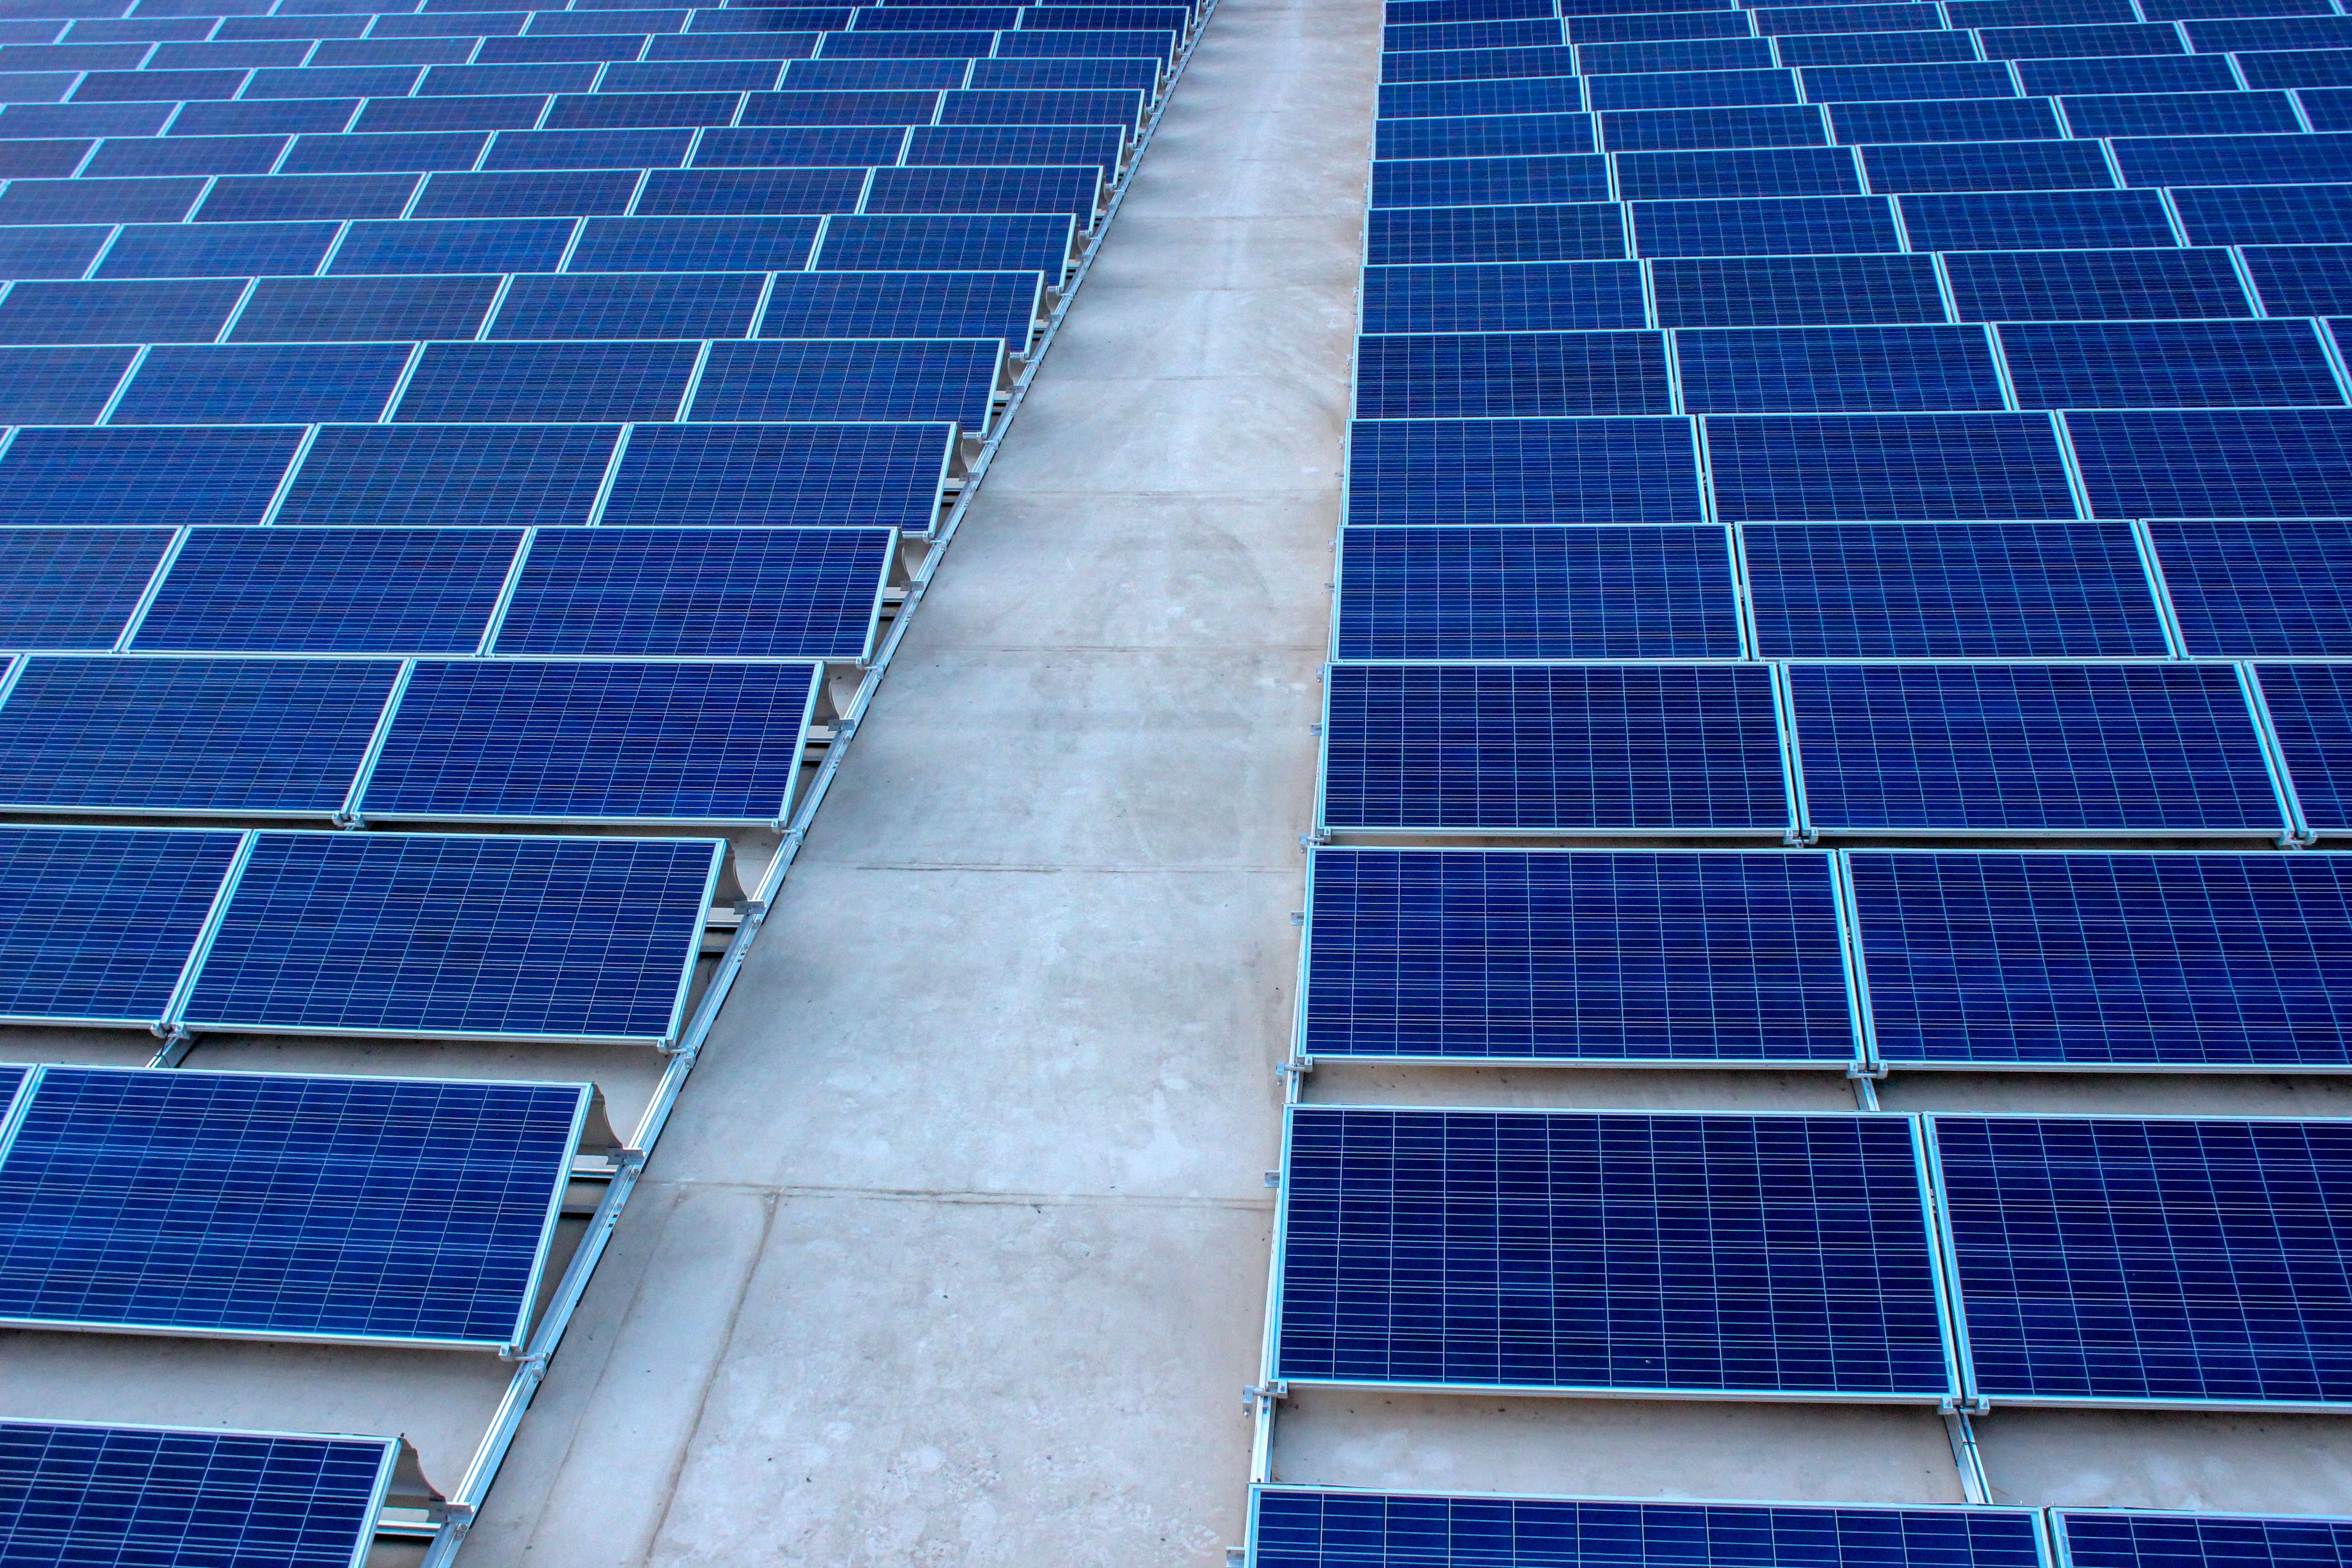 Residential Solar Supplier La Porte Tx Solar Companies Energy Industry Solar Panels